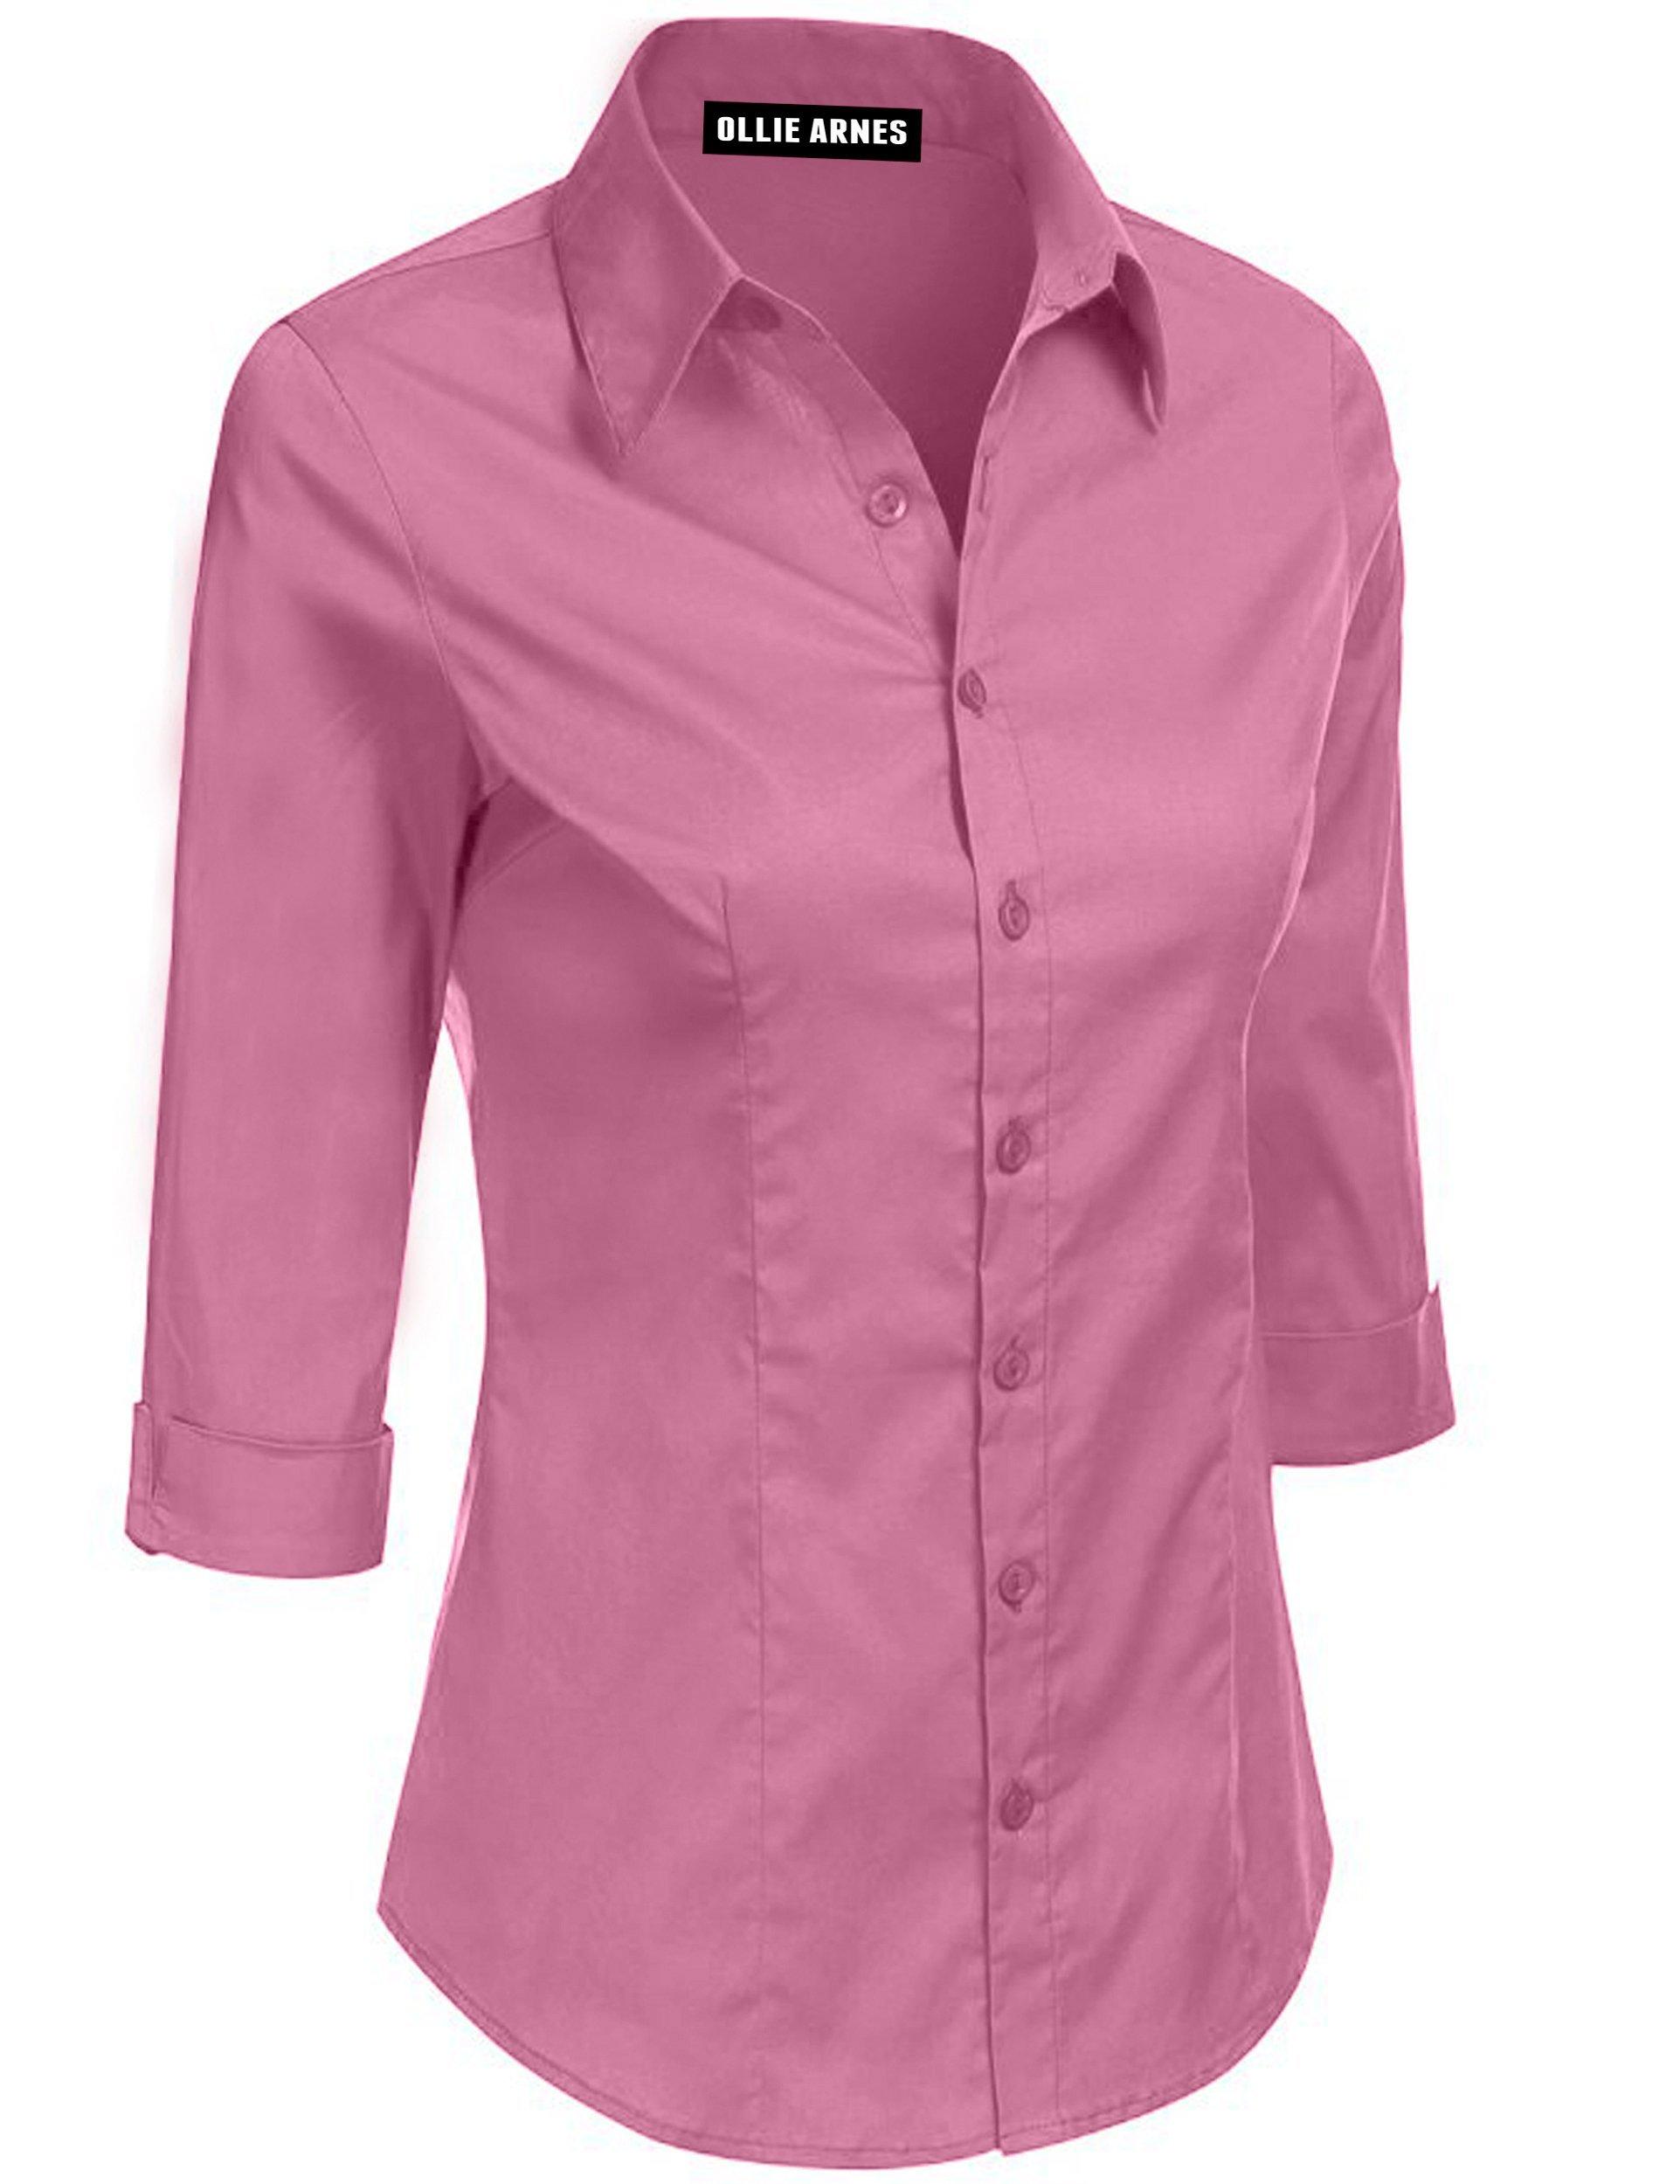 Ollie Arnes Womens Front Pocket Roll Up Sleeve Button Bown Chiffon Cotton Blouse 5A_DKMAUVE 1XL